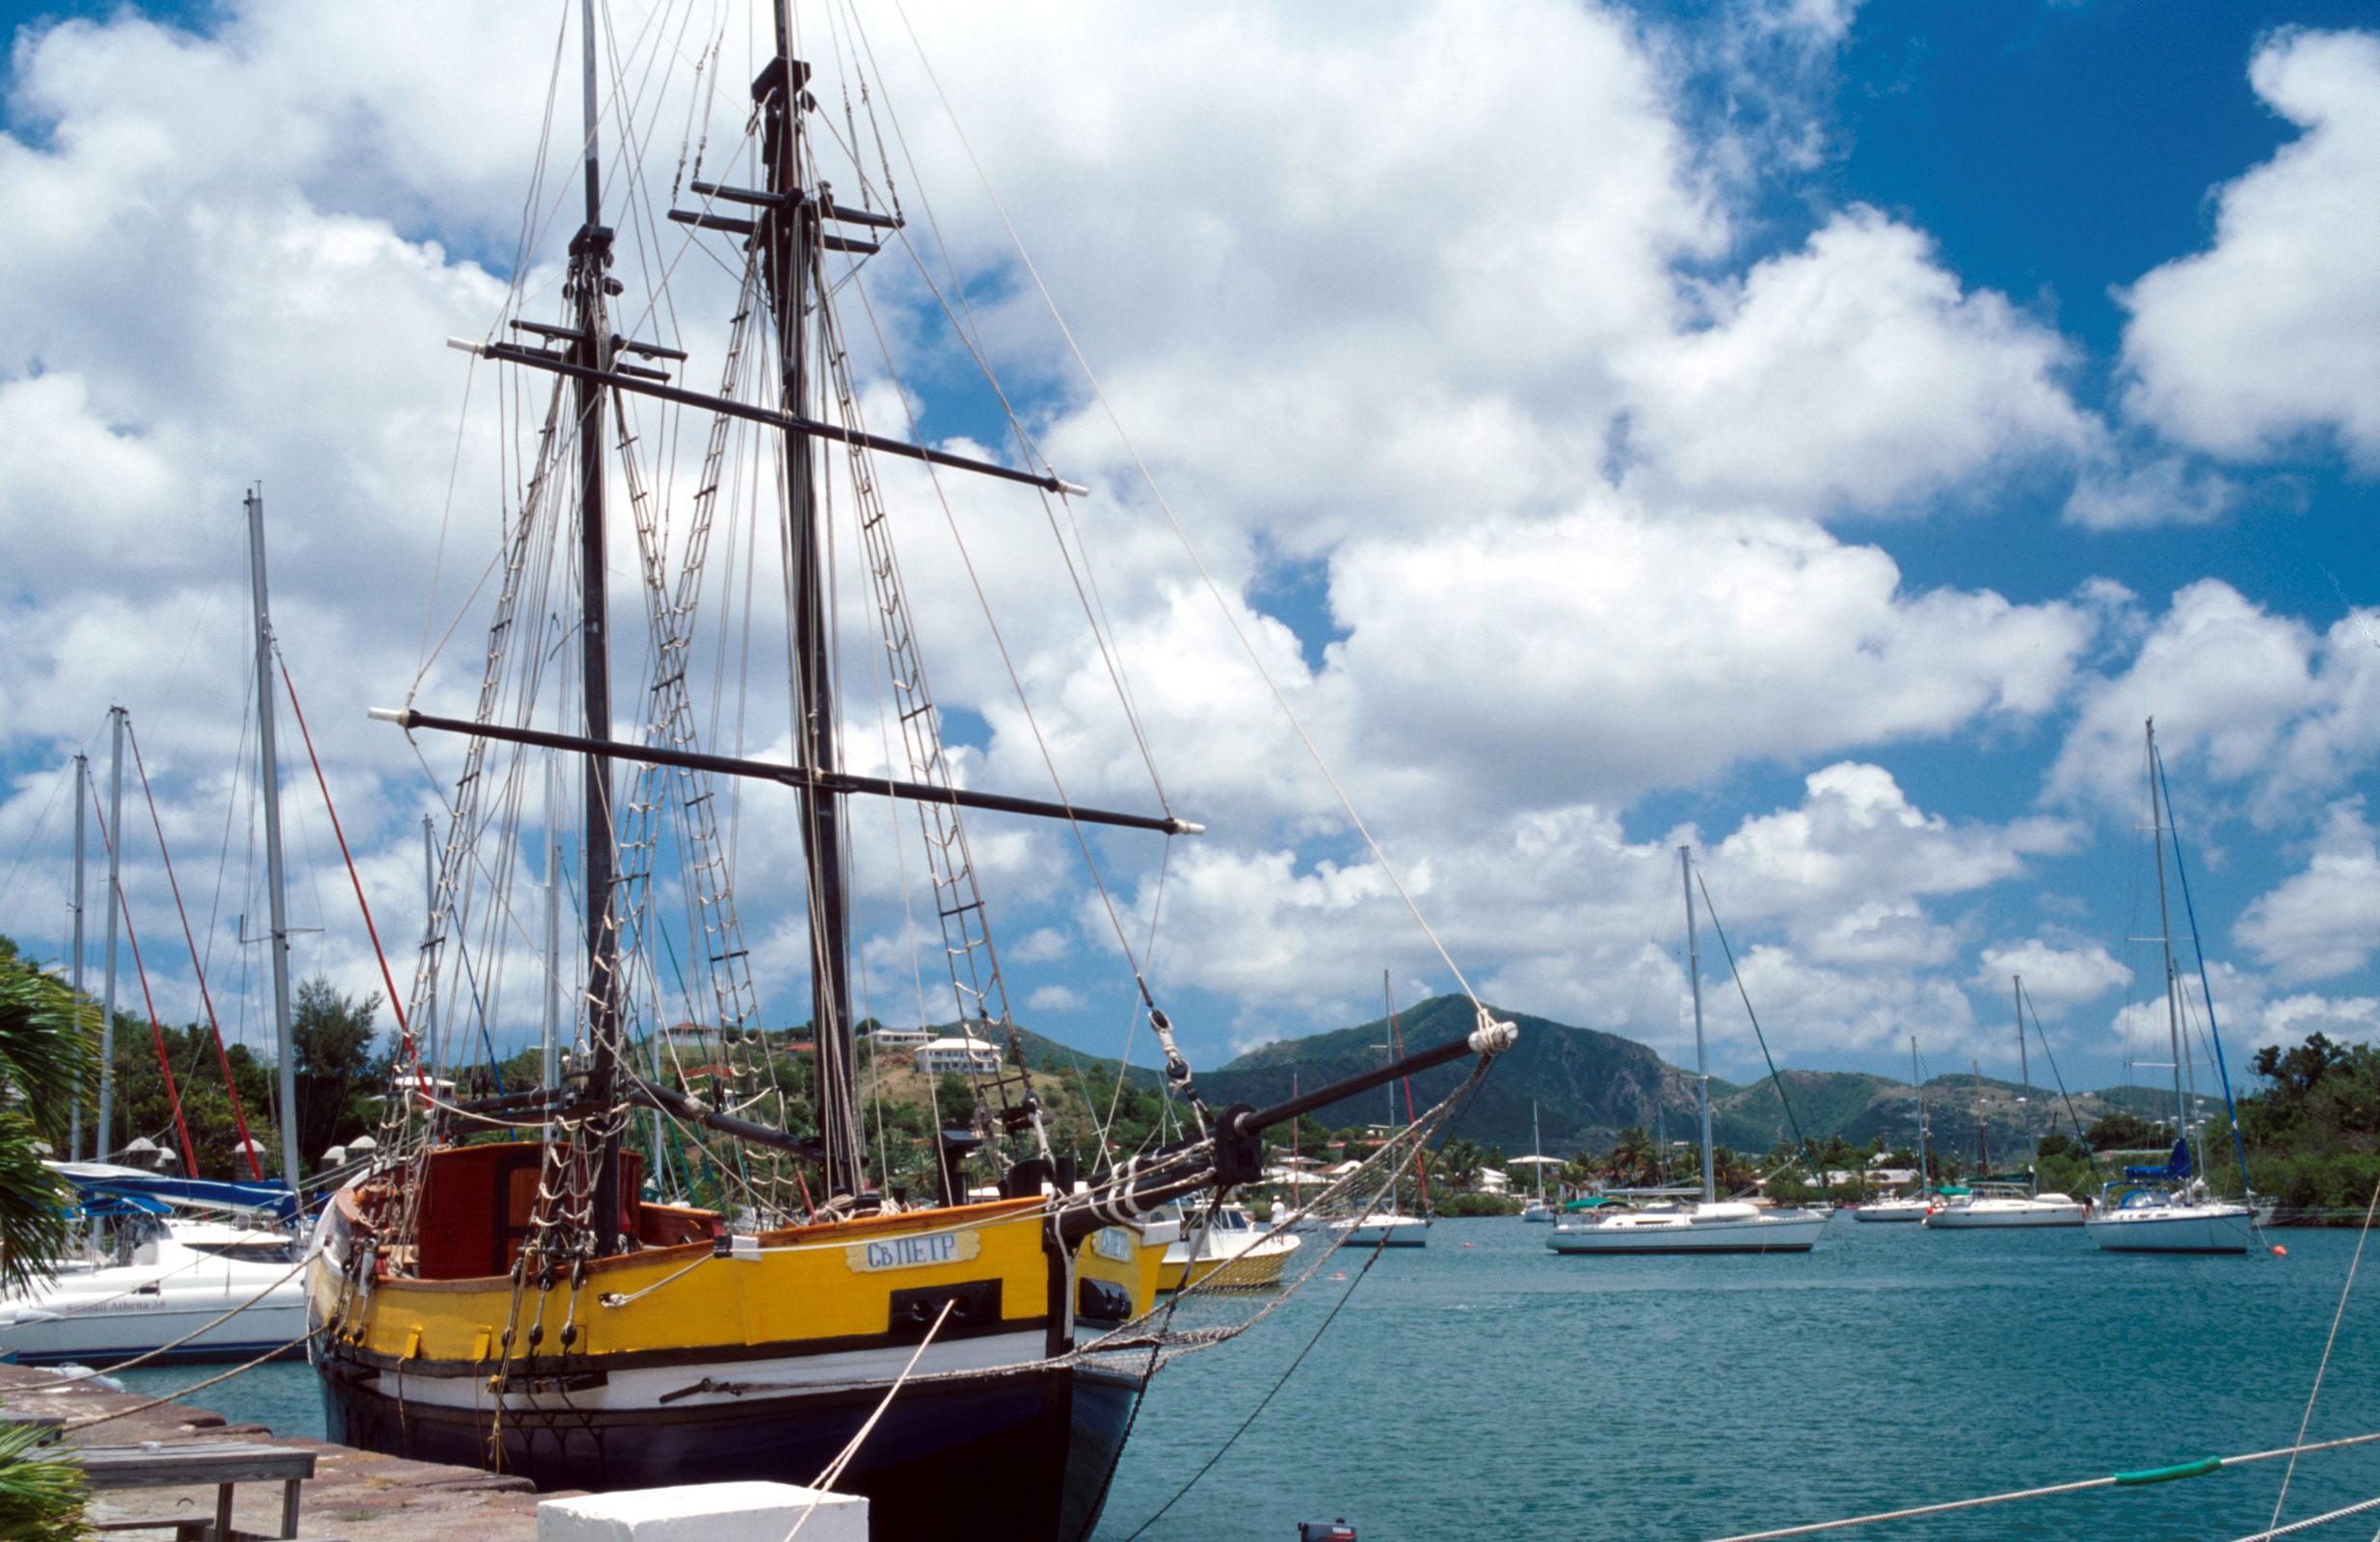 Nelsons dockyard, Antigua